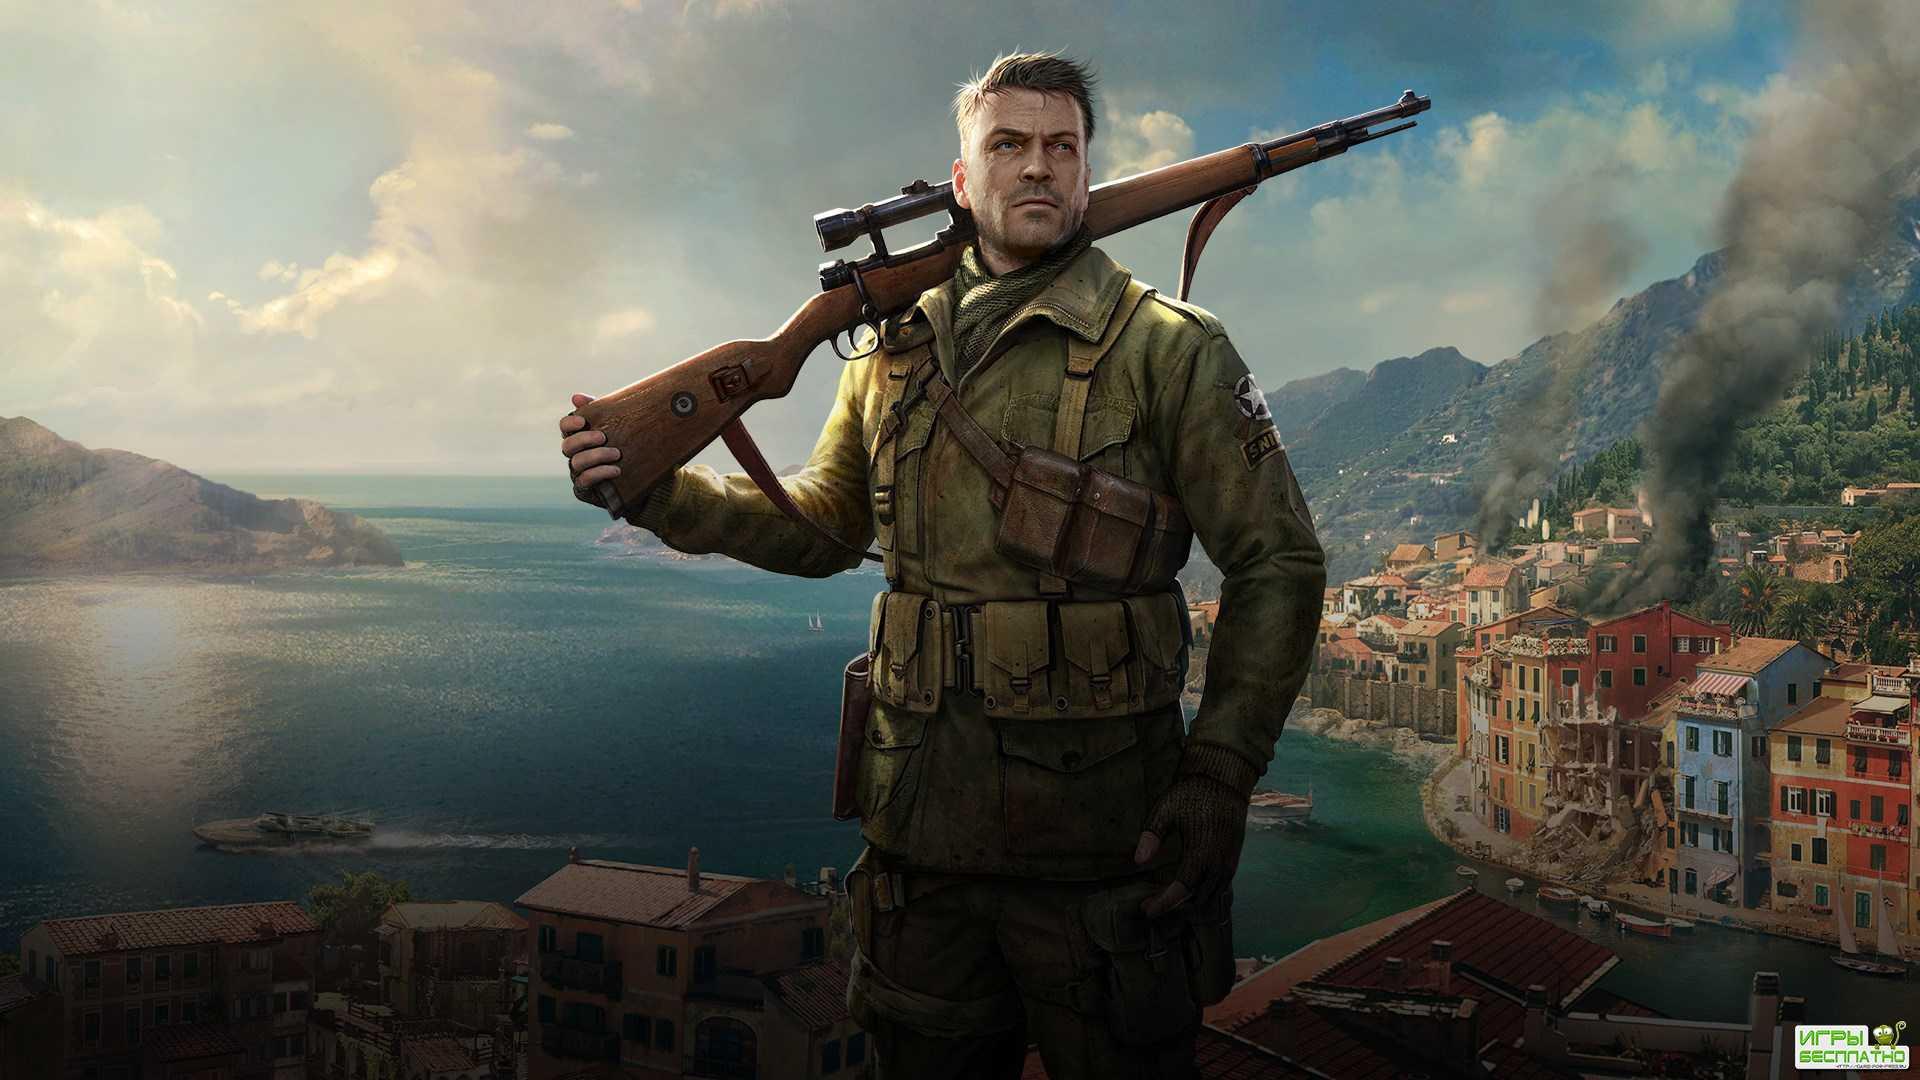 Sniper Elite станет фильмом